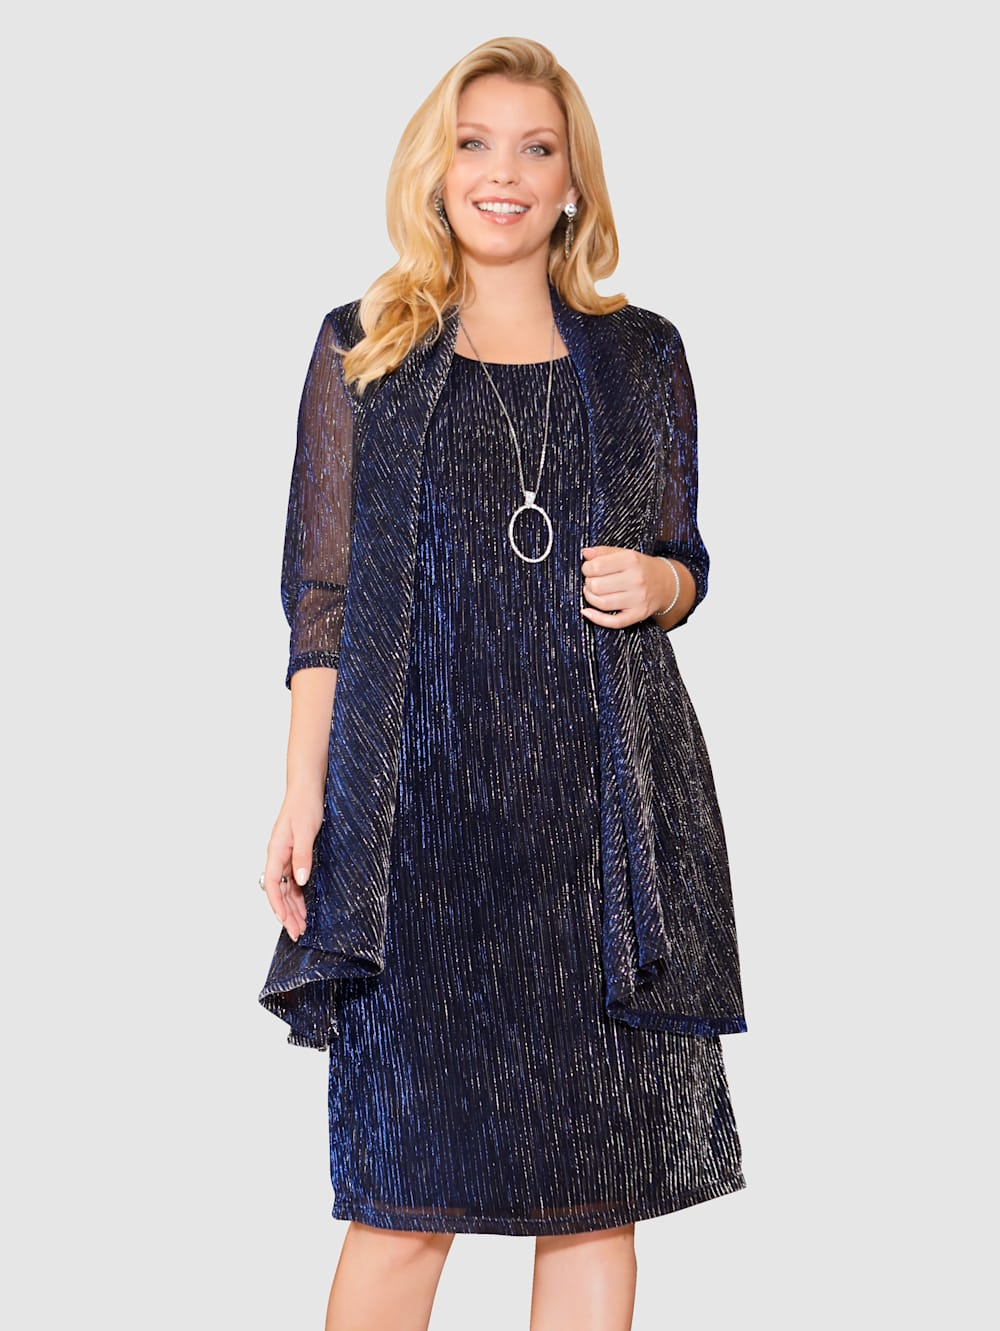 m. collection Kleid mit 2-in-1 Optik | Klingel